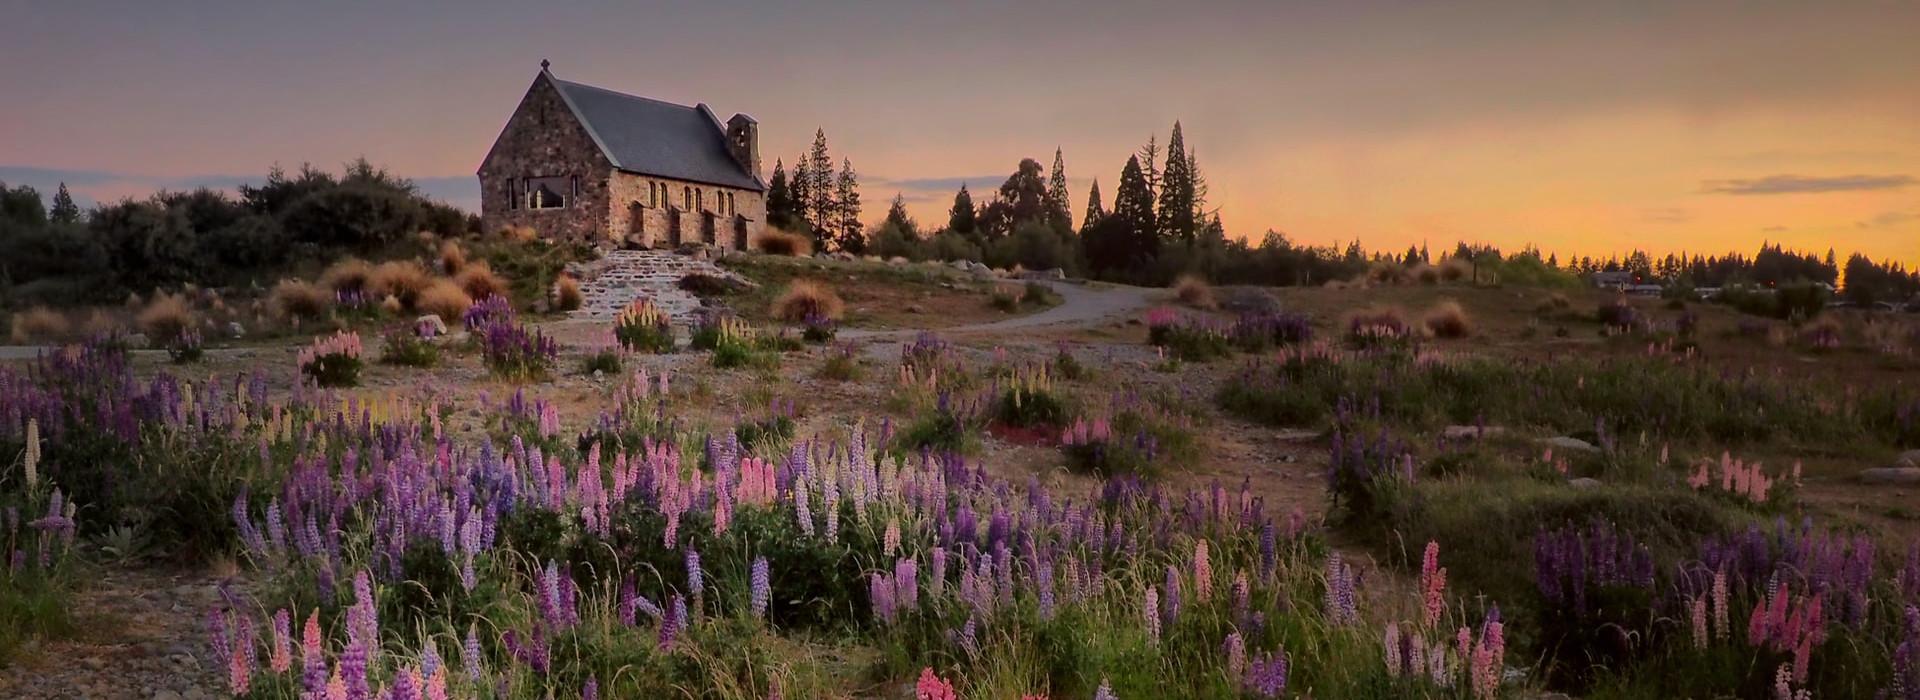 Iconic Church of the Good Shepherd @peterham